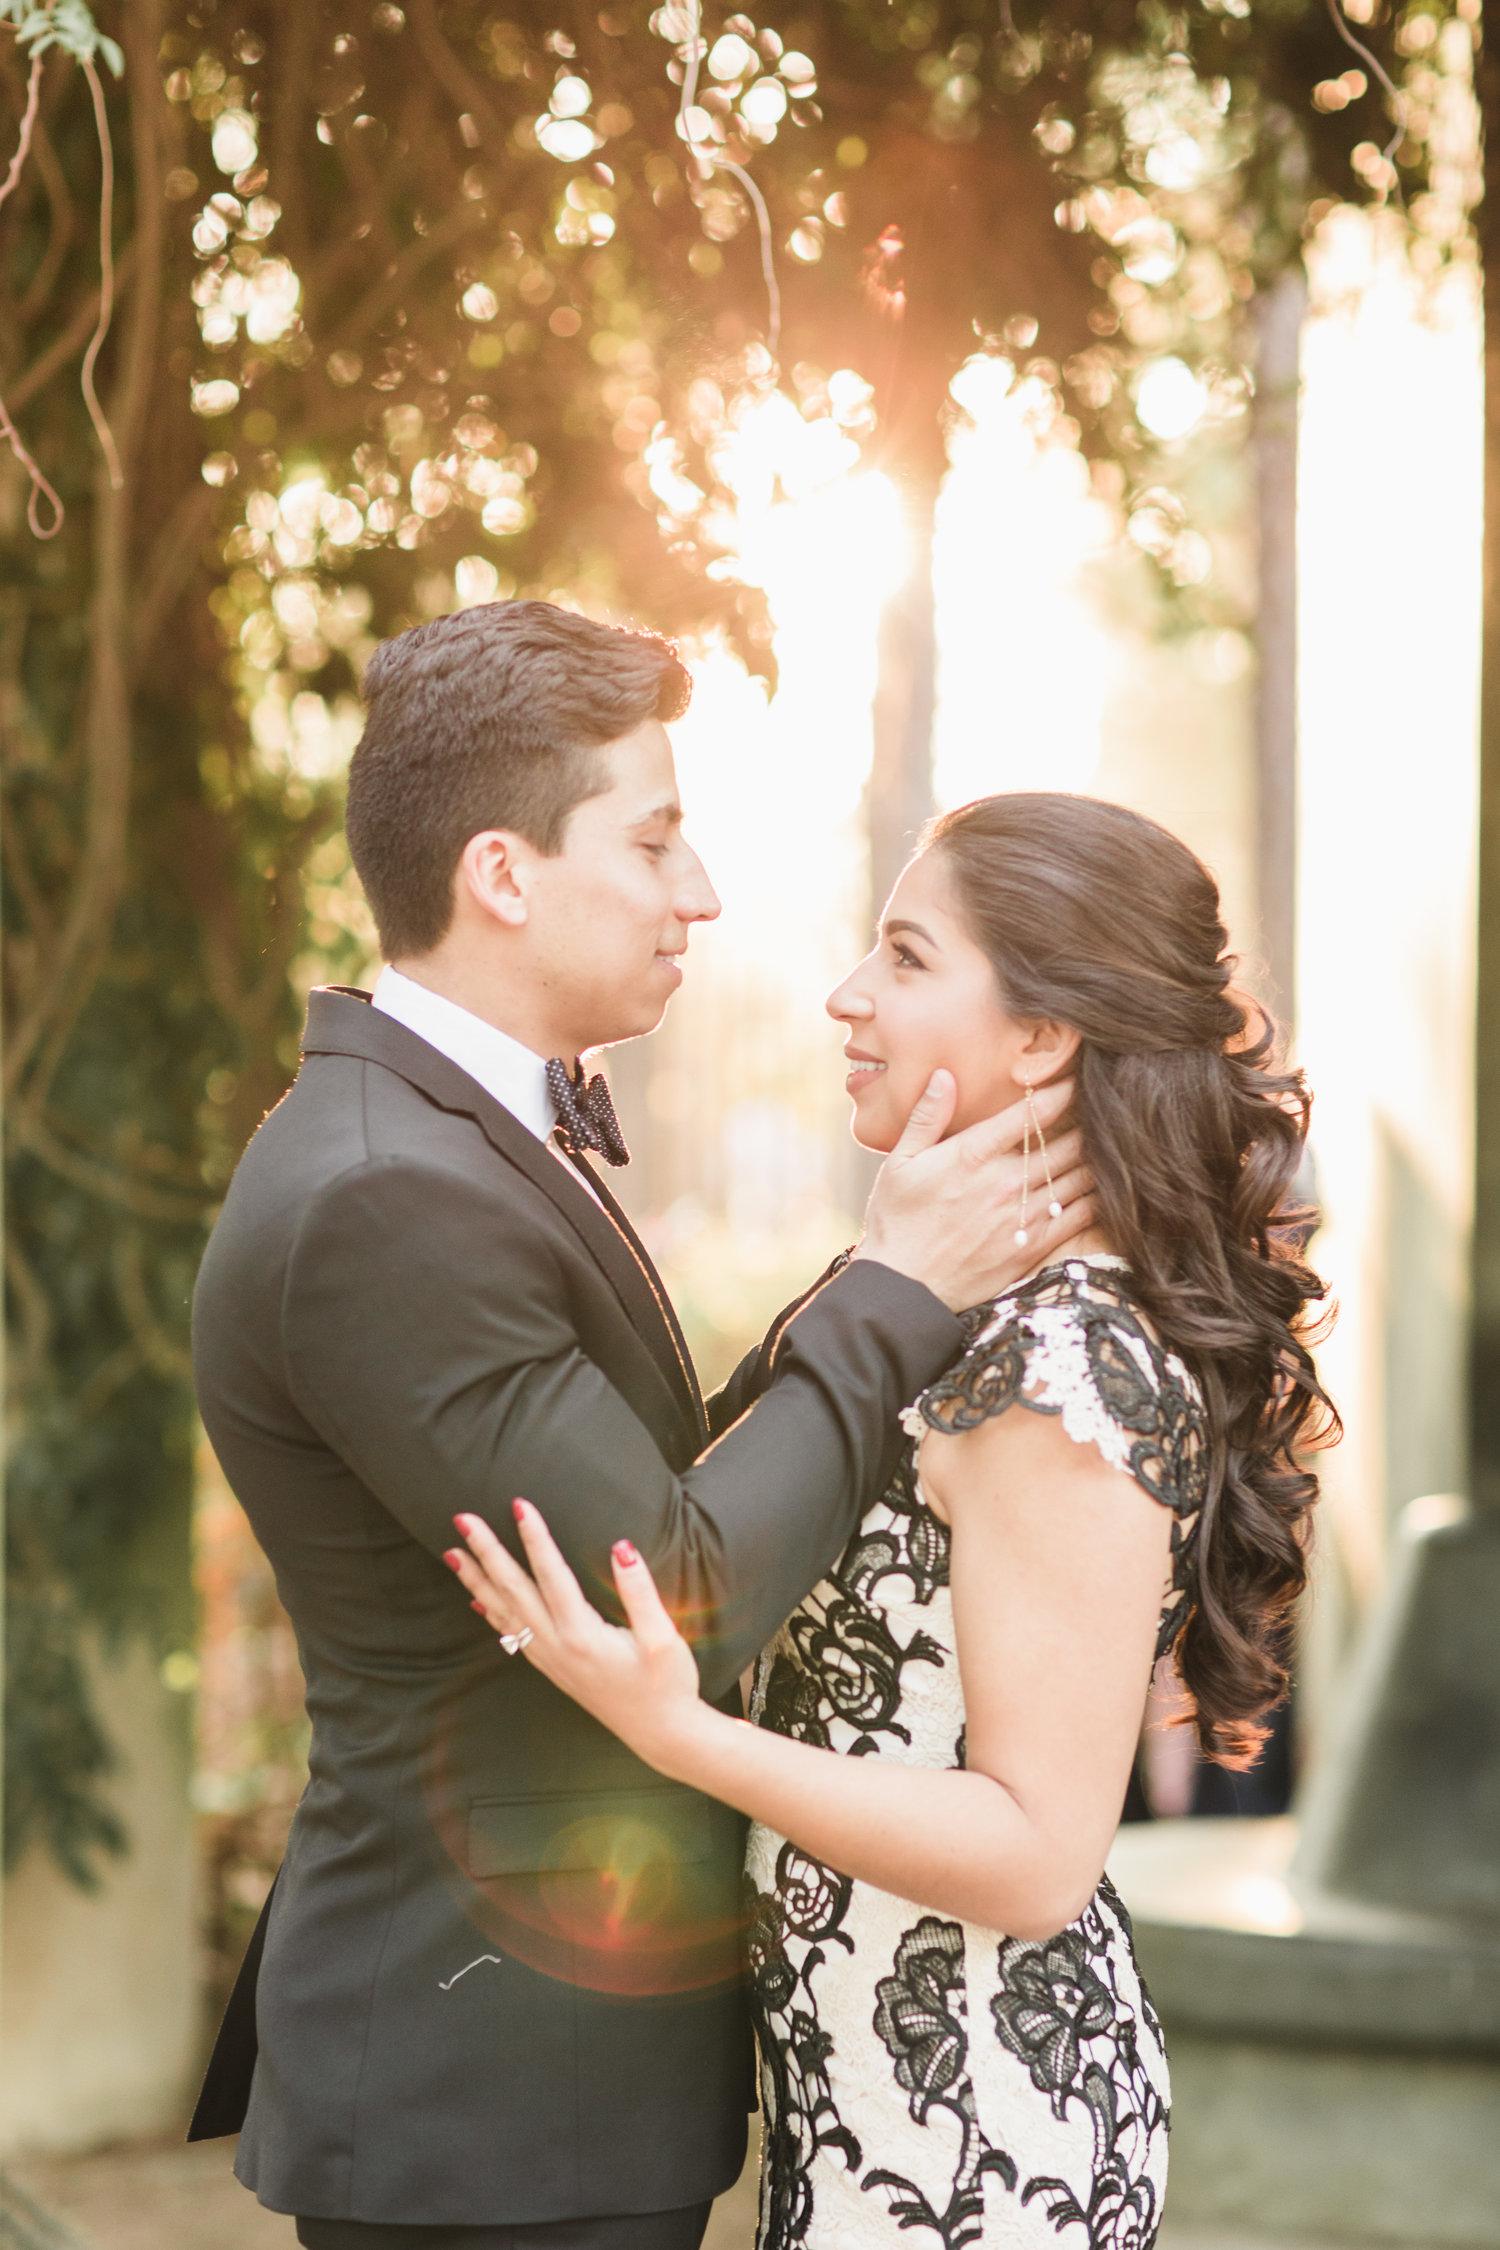 2017-12-03-Engagement-Daniel-and-Jessica-0599.jpg